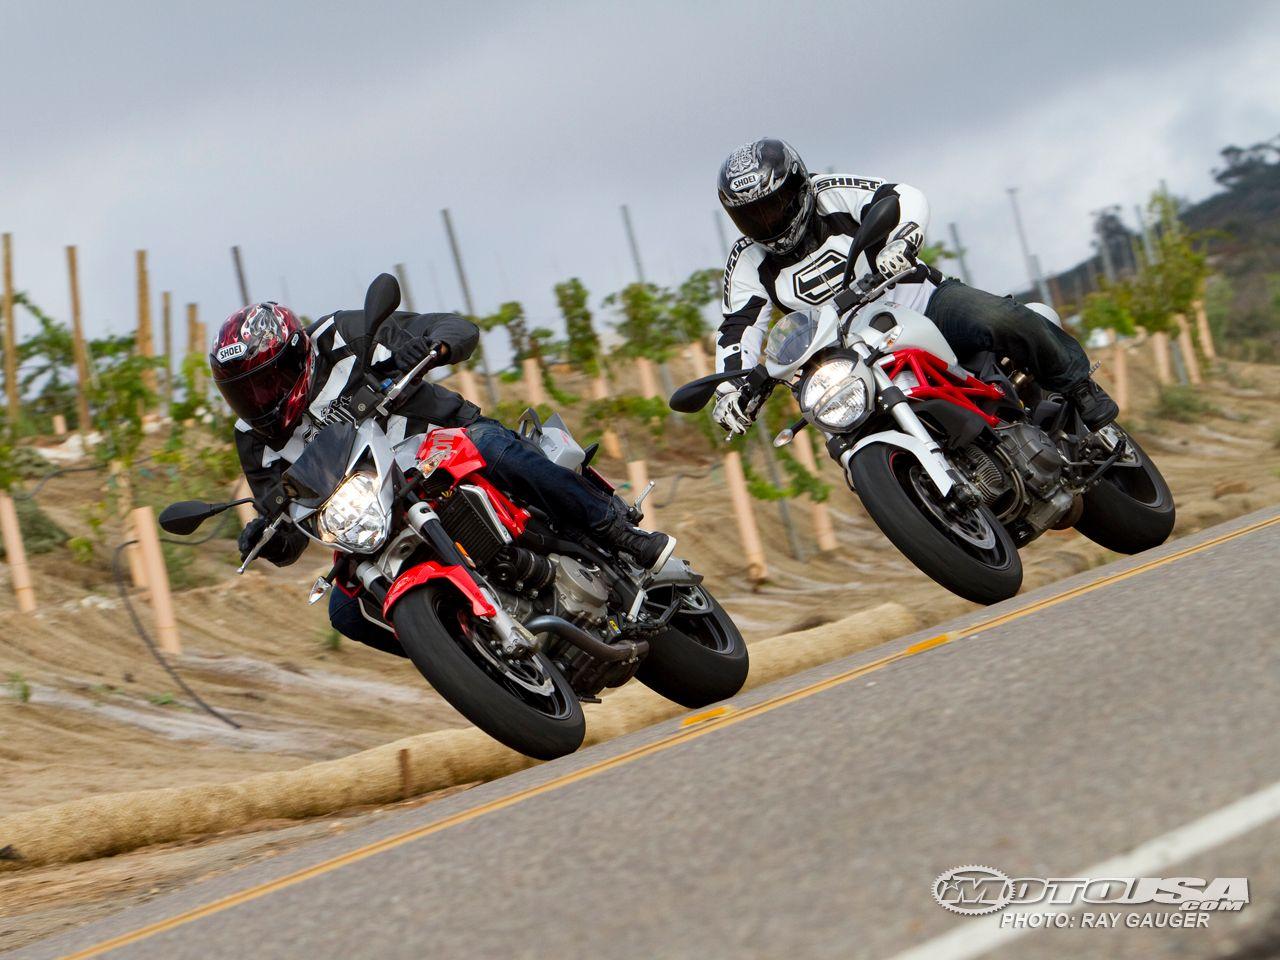 2011 Aprilia Shiver 750 vs Ducati Monster 796